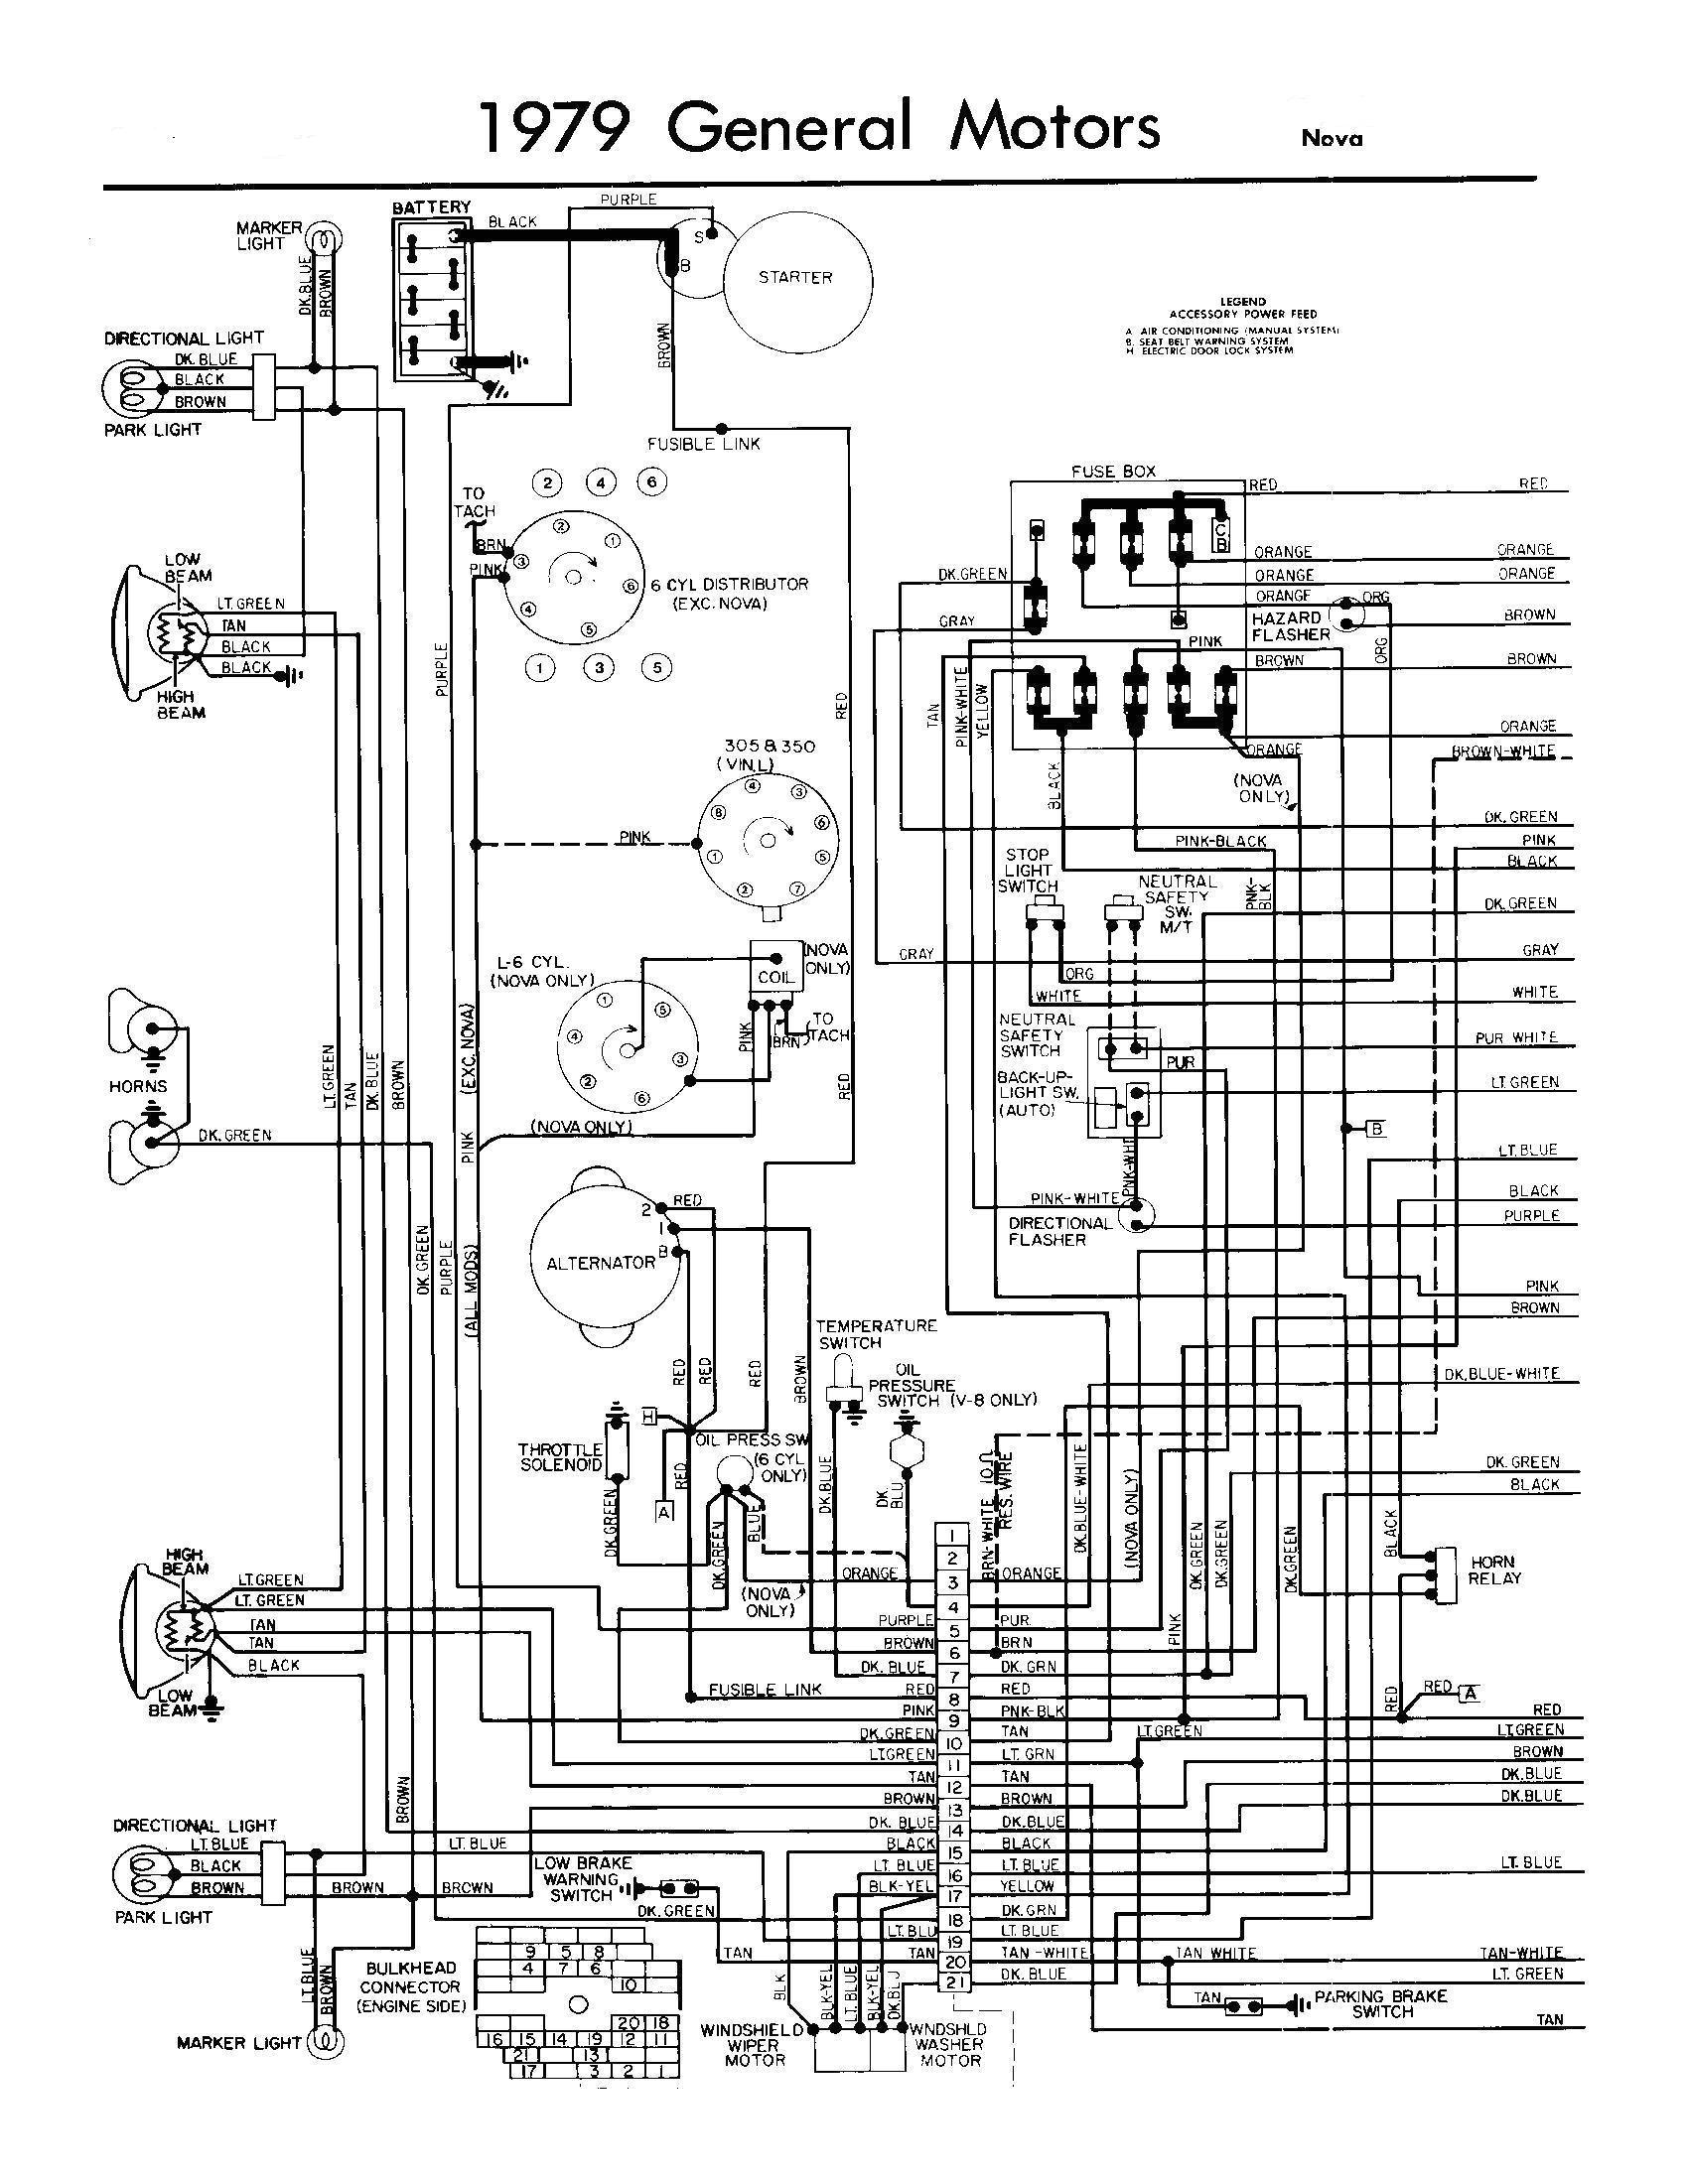 82 c10 engine wiring harness diagram wiring diagrams favorites 1969 c10 engine wiring diagram 82 c10